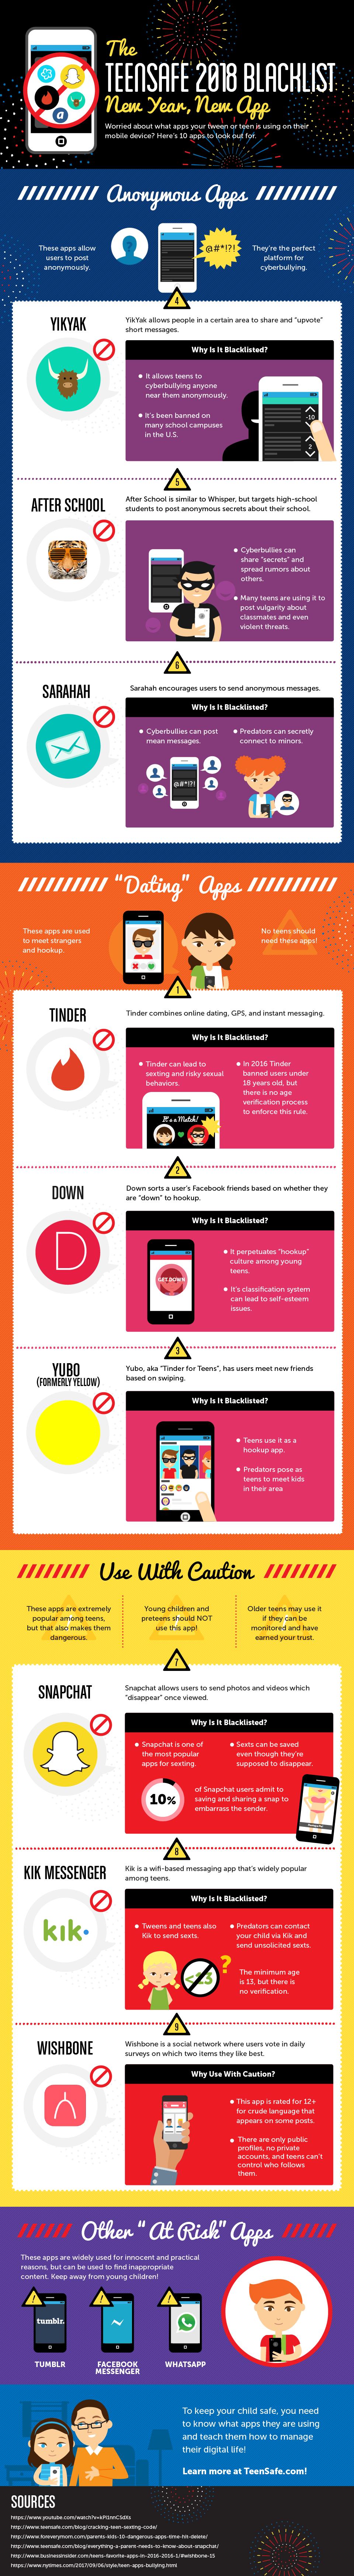 Smartphone App Blacklist 2018 - #infographic